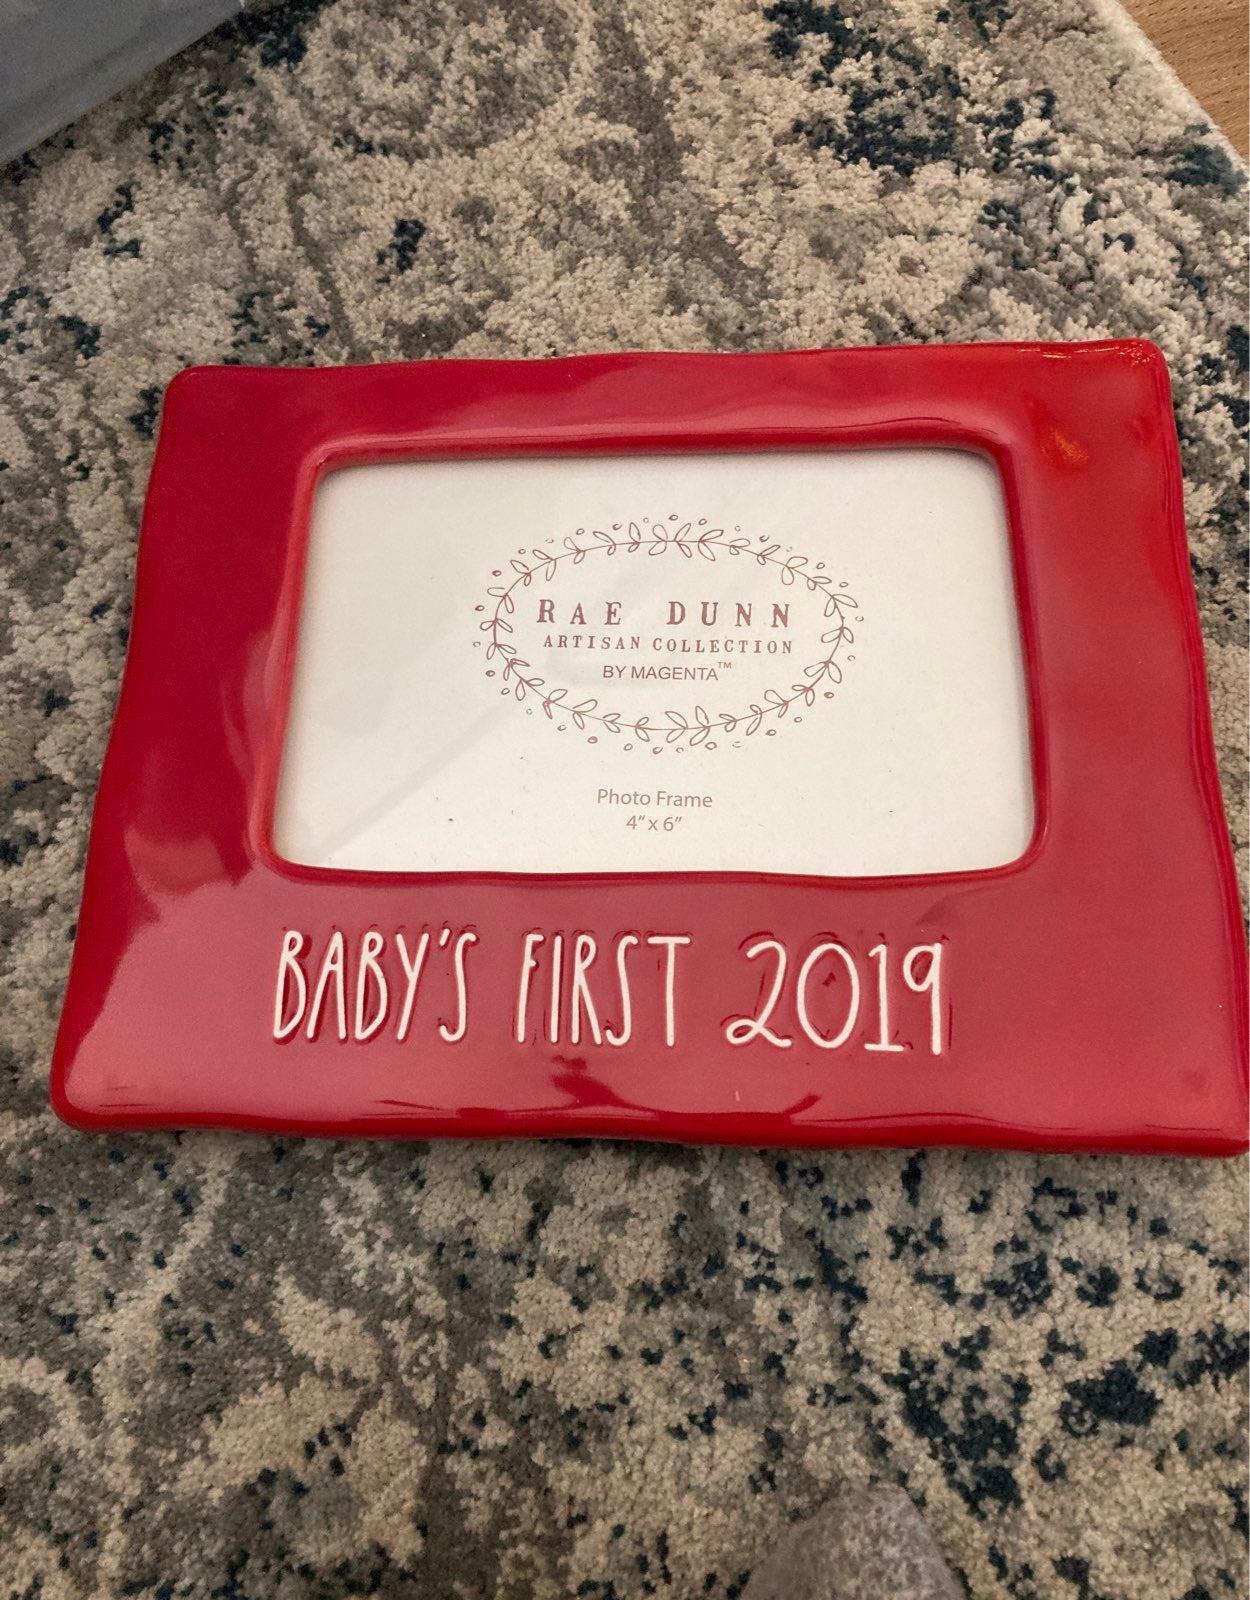 Rae Dunn Baby's First 2019